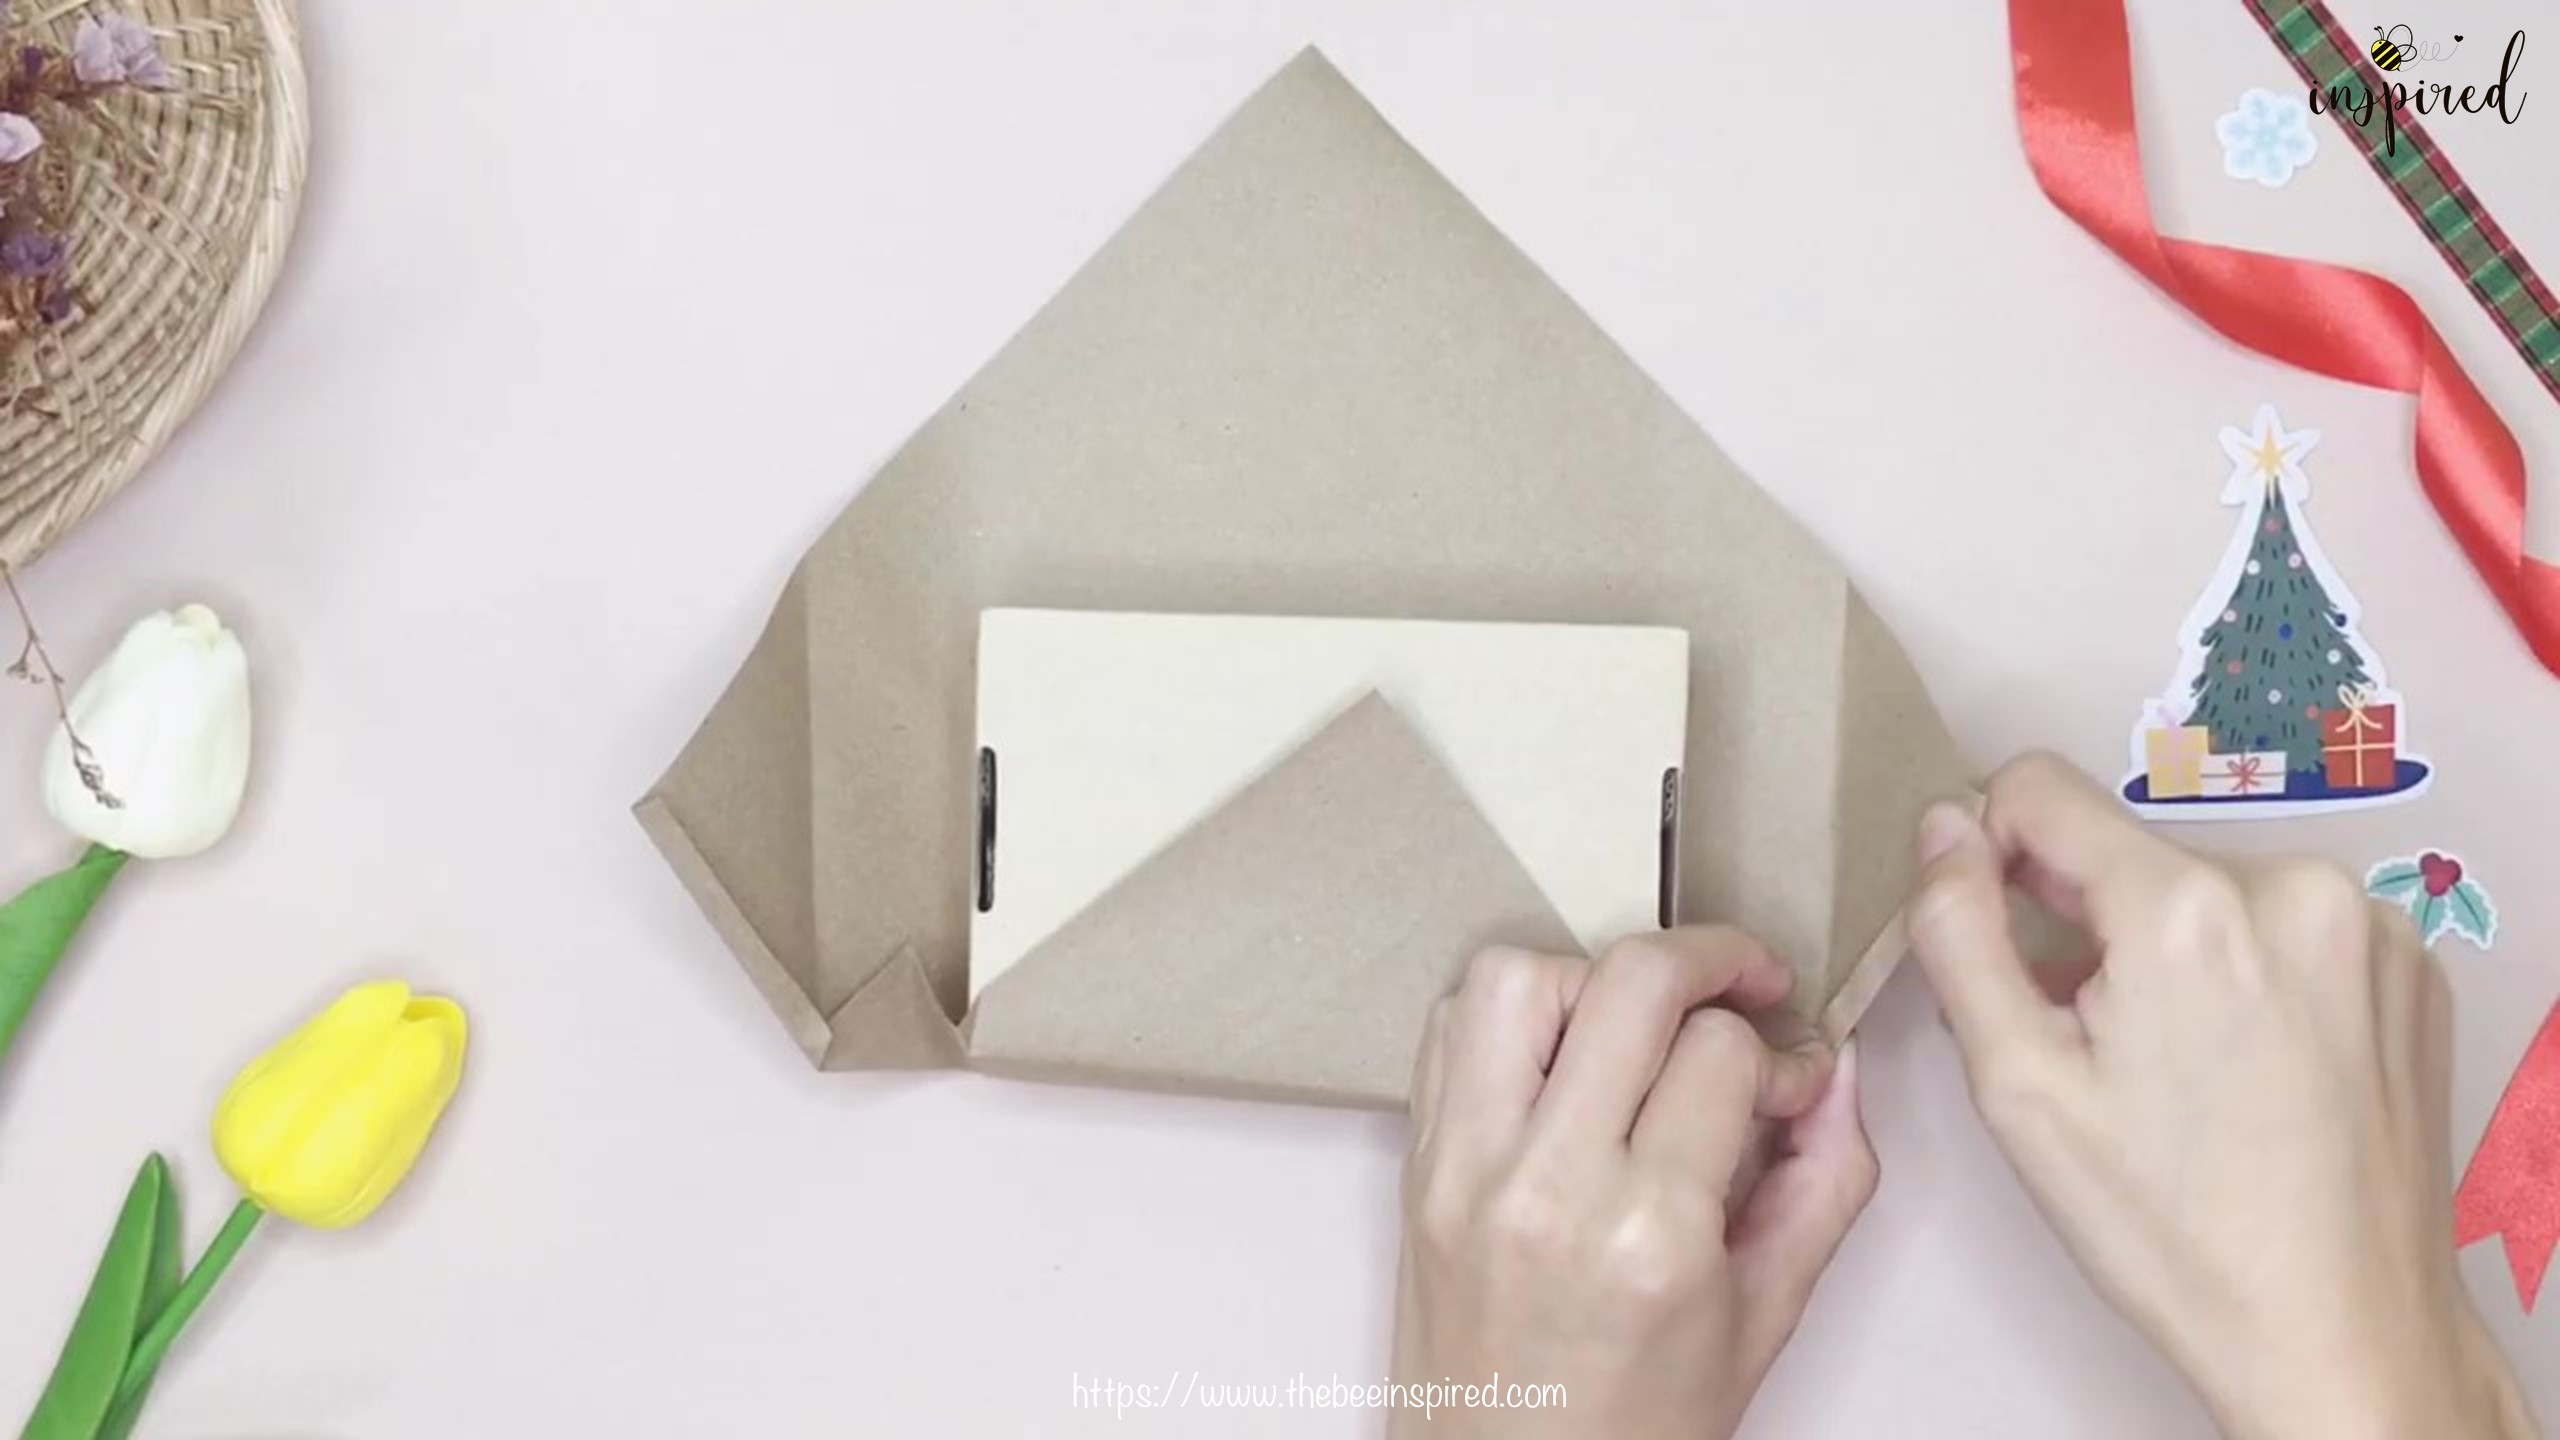 DIY วิธีห่อของขวัญวันวาเลนไทน์ วันปีใหม่ วันคริสมาส & วันเกิด แบบประหยัดกระดาษ_ Gift Wrapping Hack_8